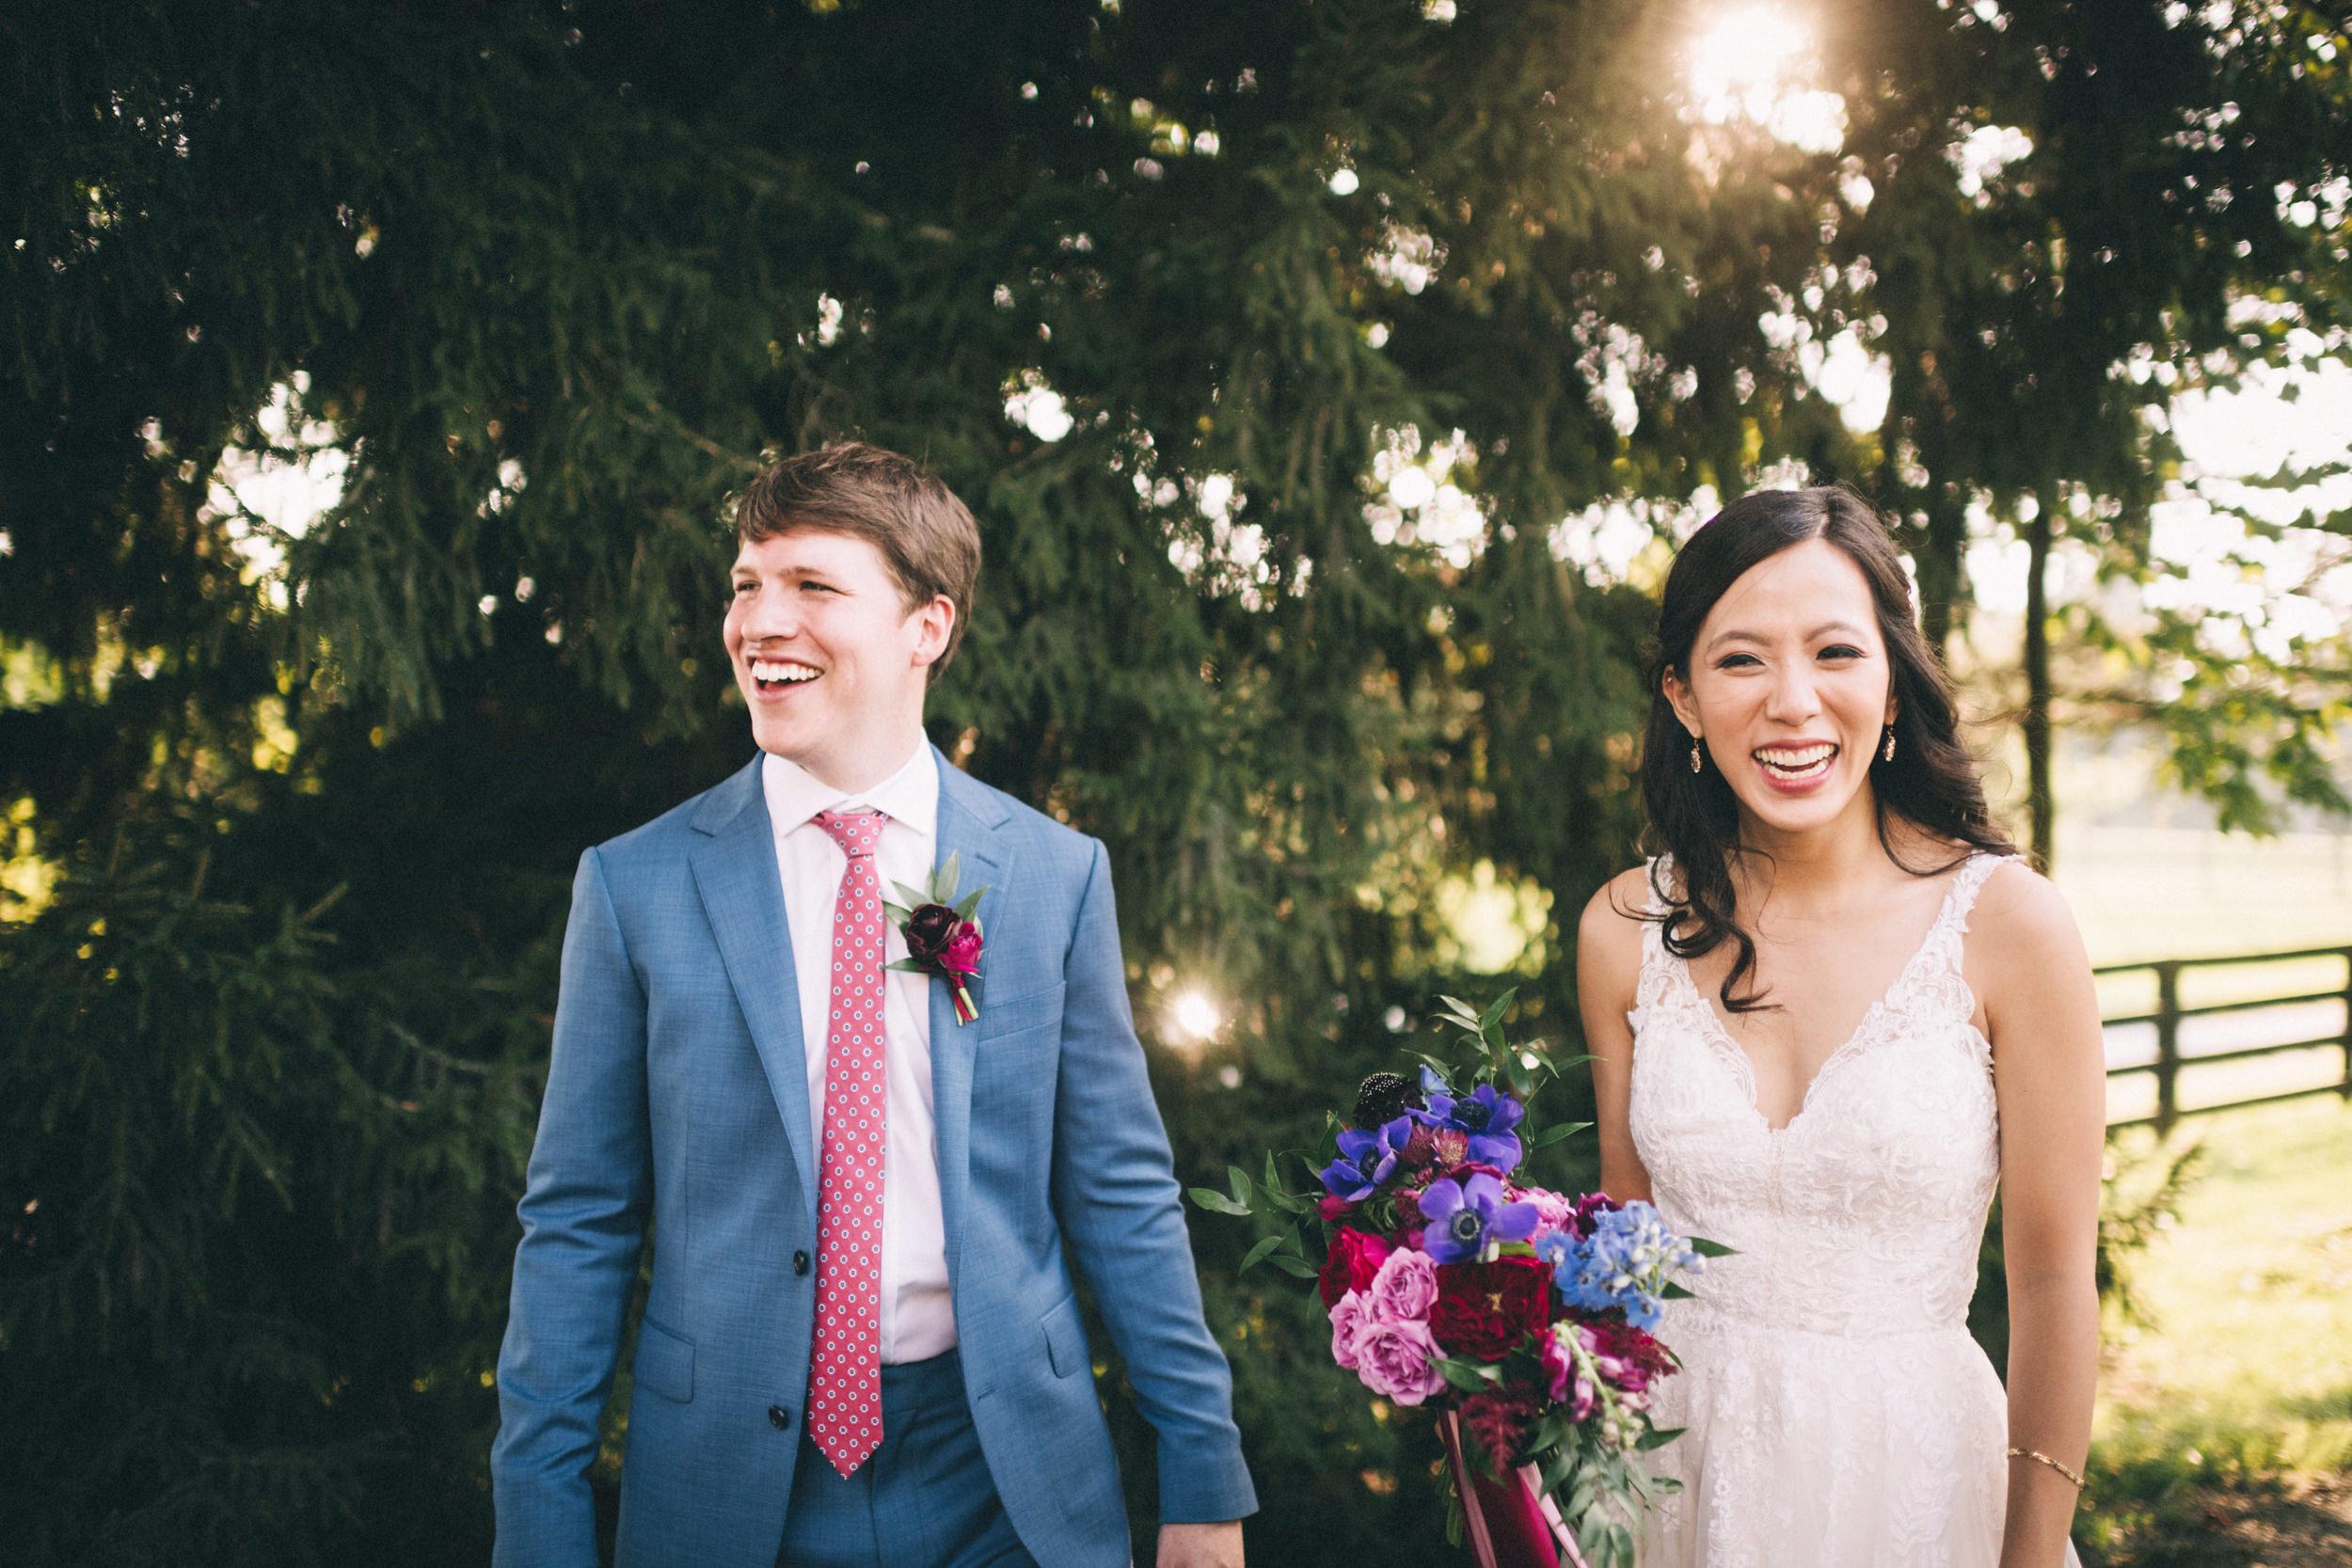 Louisville-Kentucky-Wedding-and-Elopement-Photographer-Sarah-Katherine-Davis-Photography-Summer-Jewel-Toned-Wedding-Chineese-Tea-Ceremony-Warrenwood-Manor-Danville-644.jpg